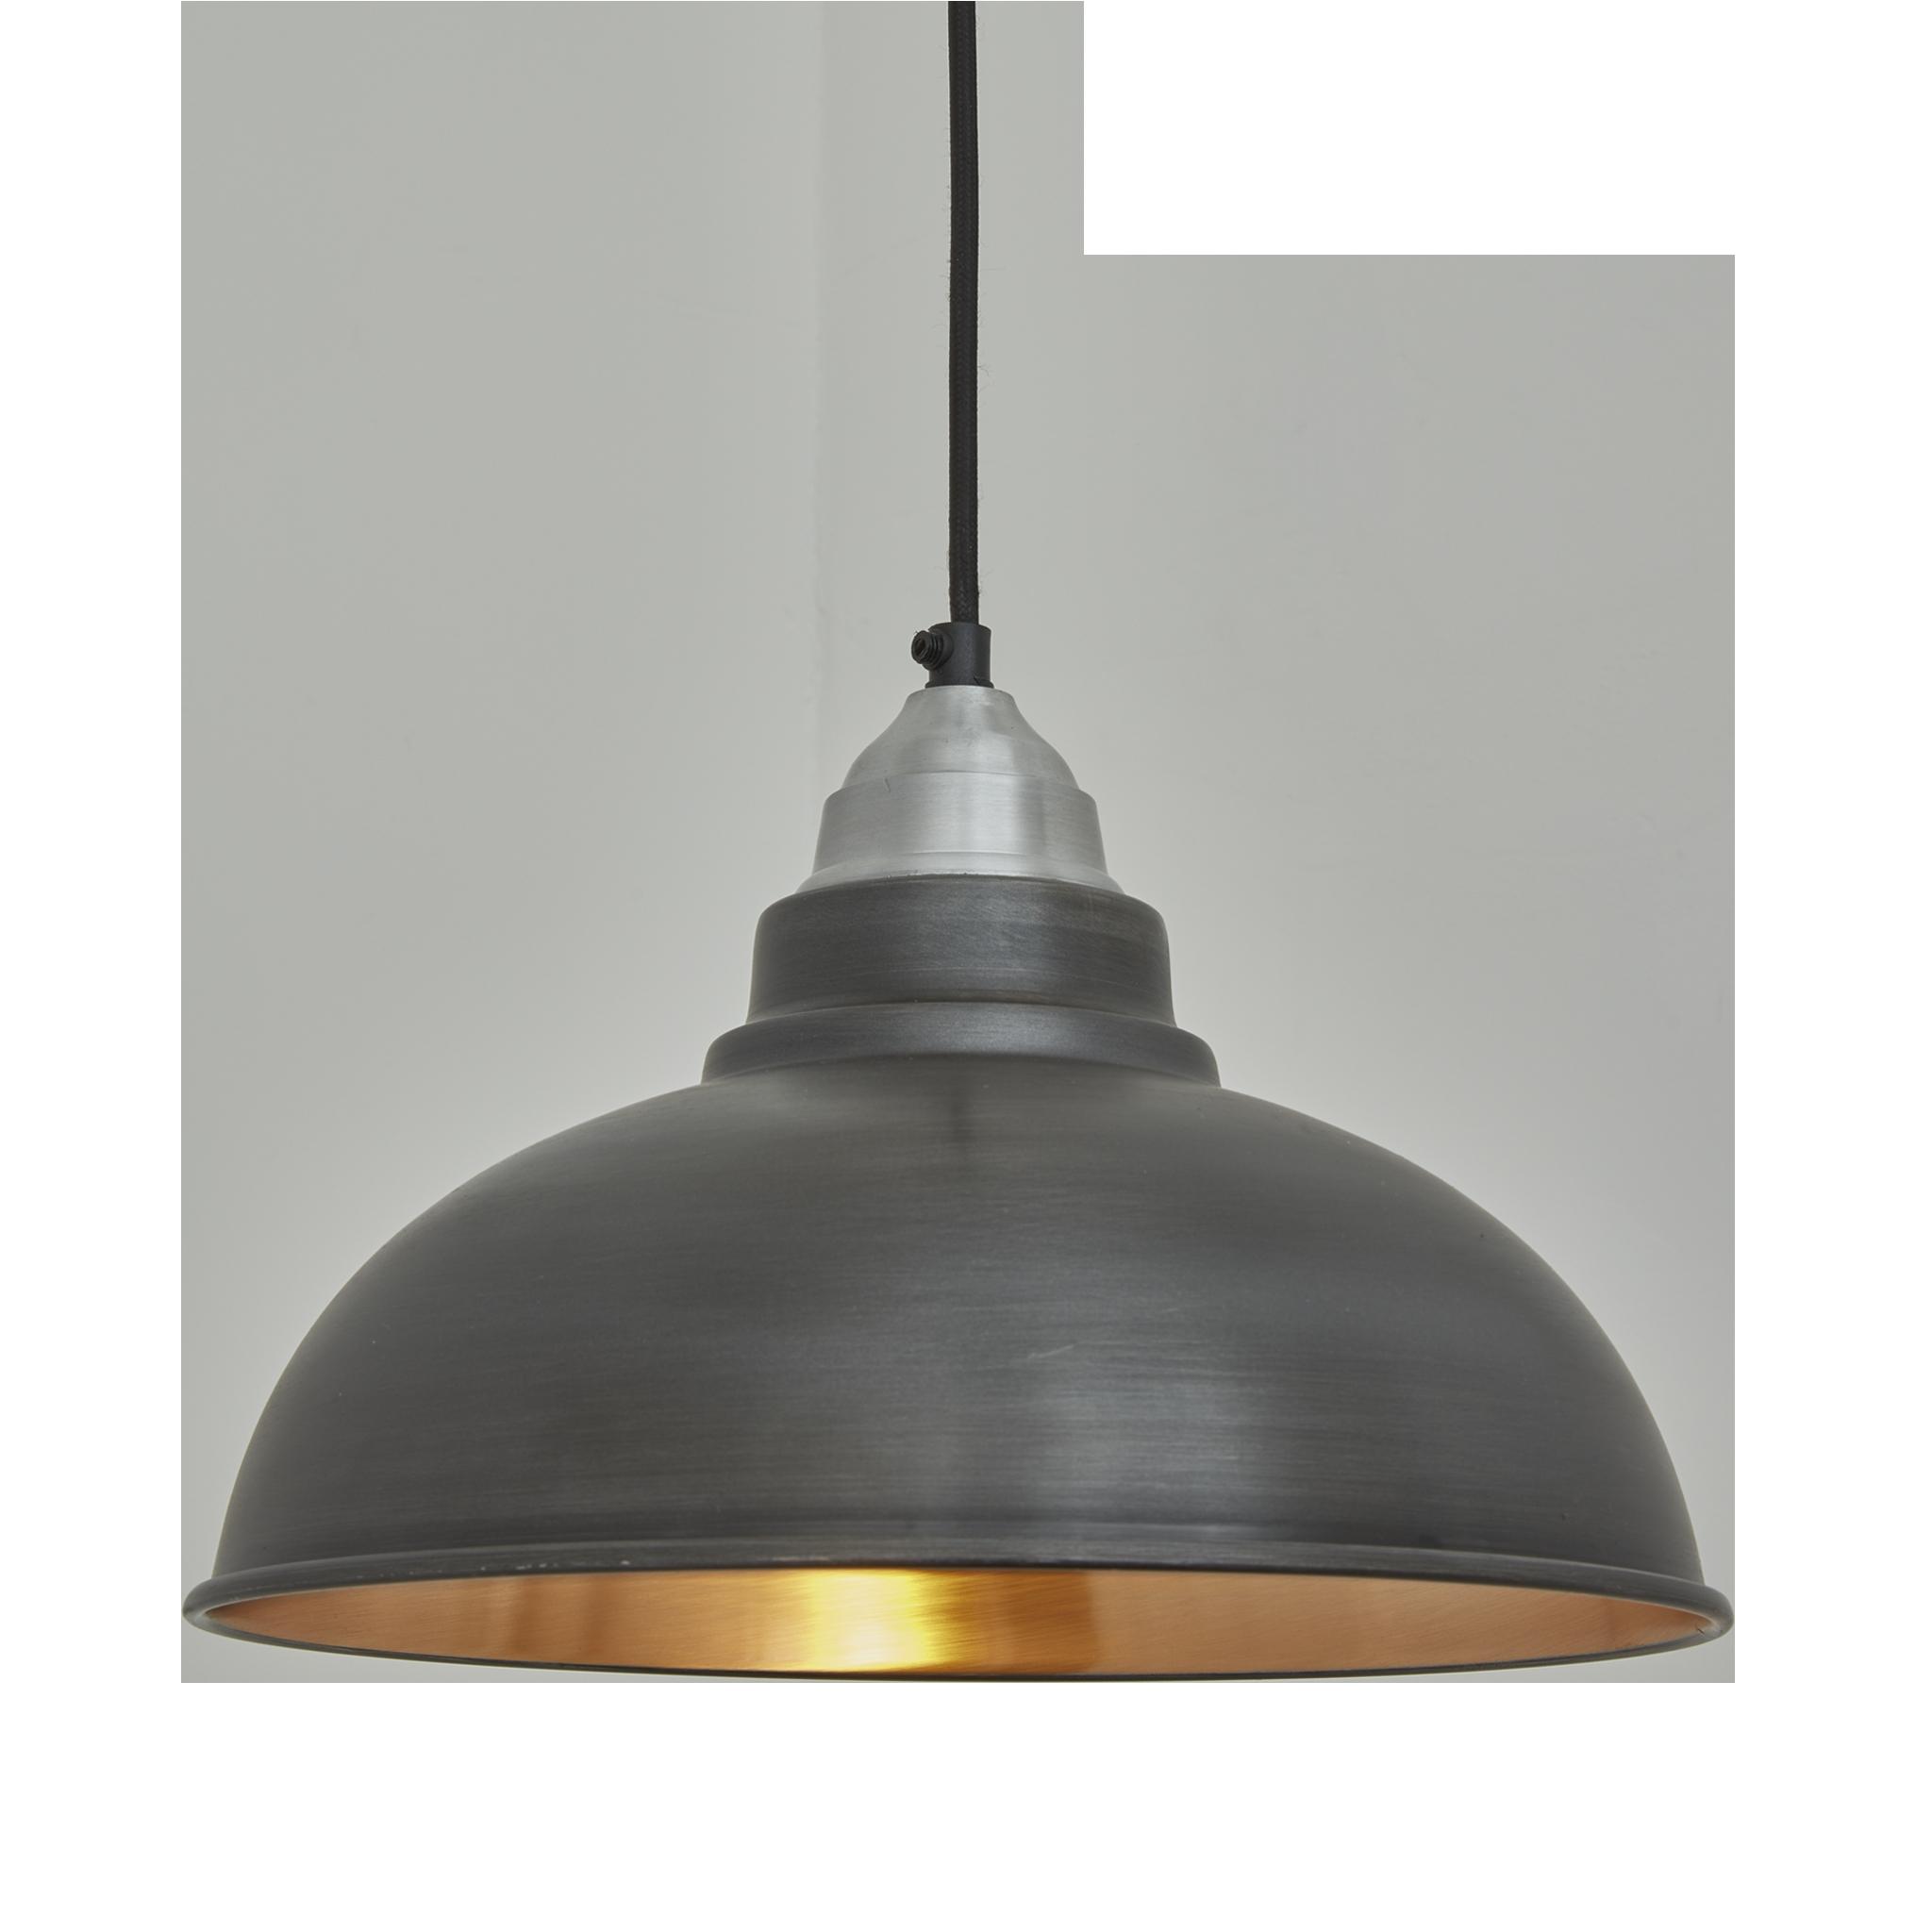 old factory vintage pendant light dark pewter and copper industville a79